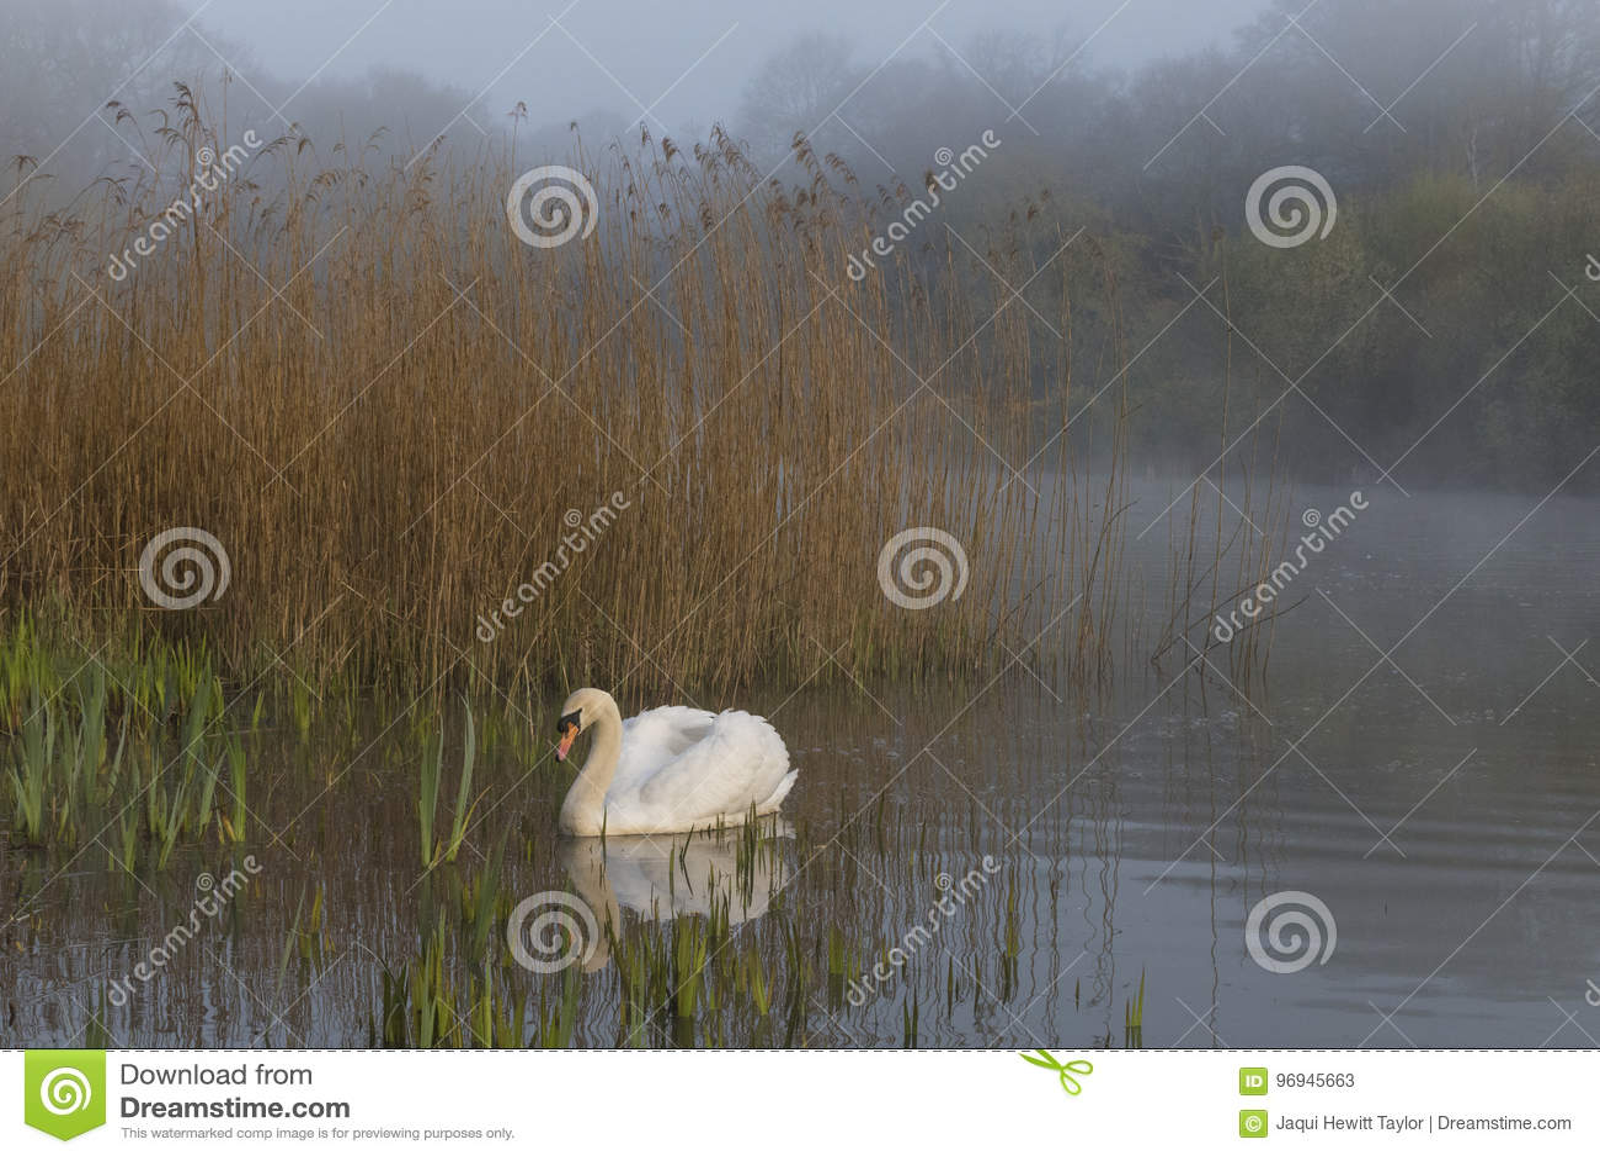 Swan in mist Southampton Common